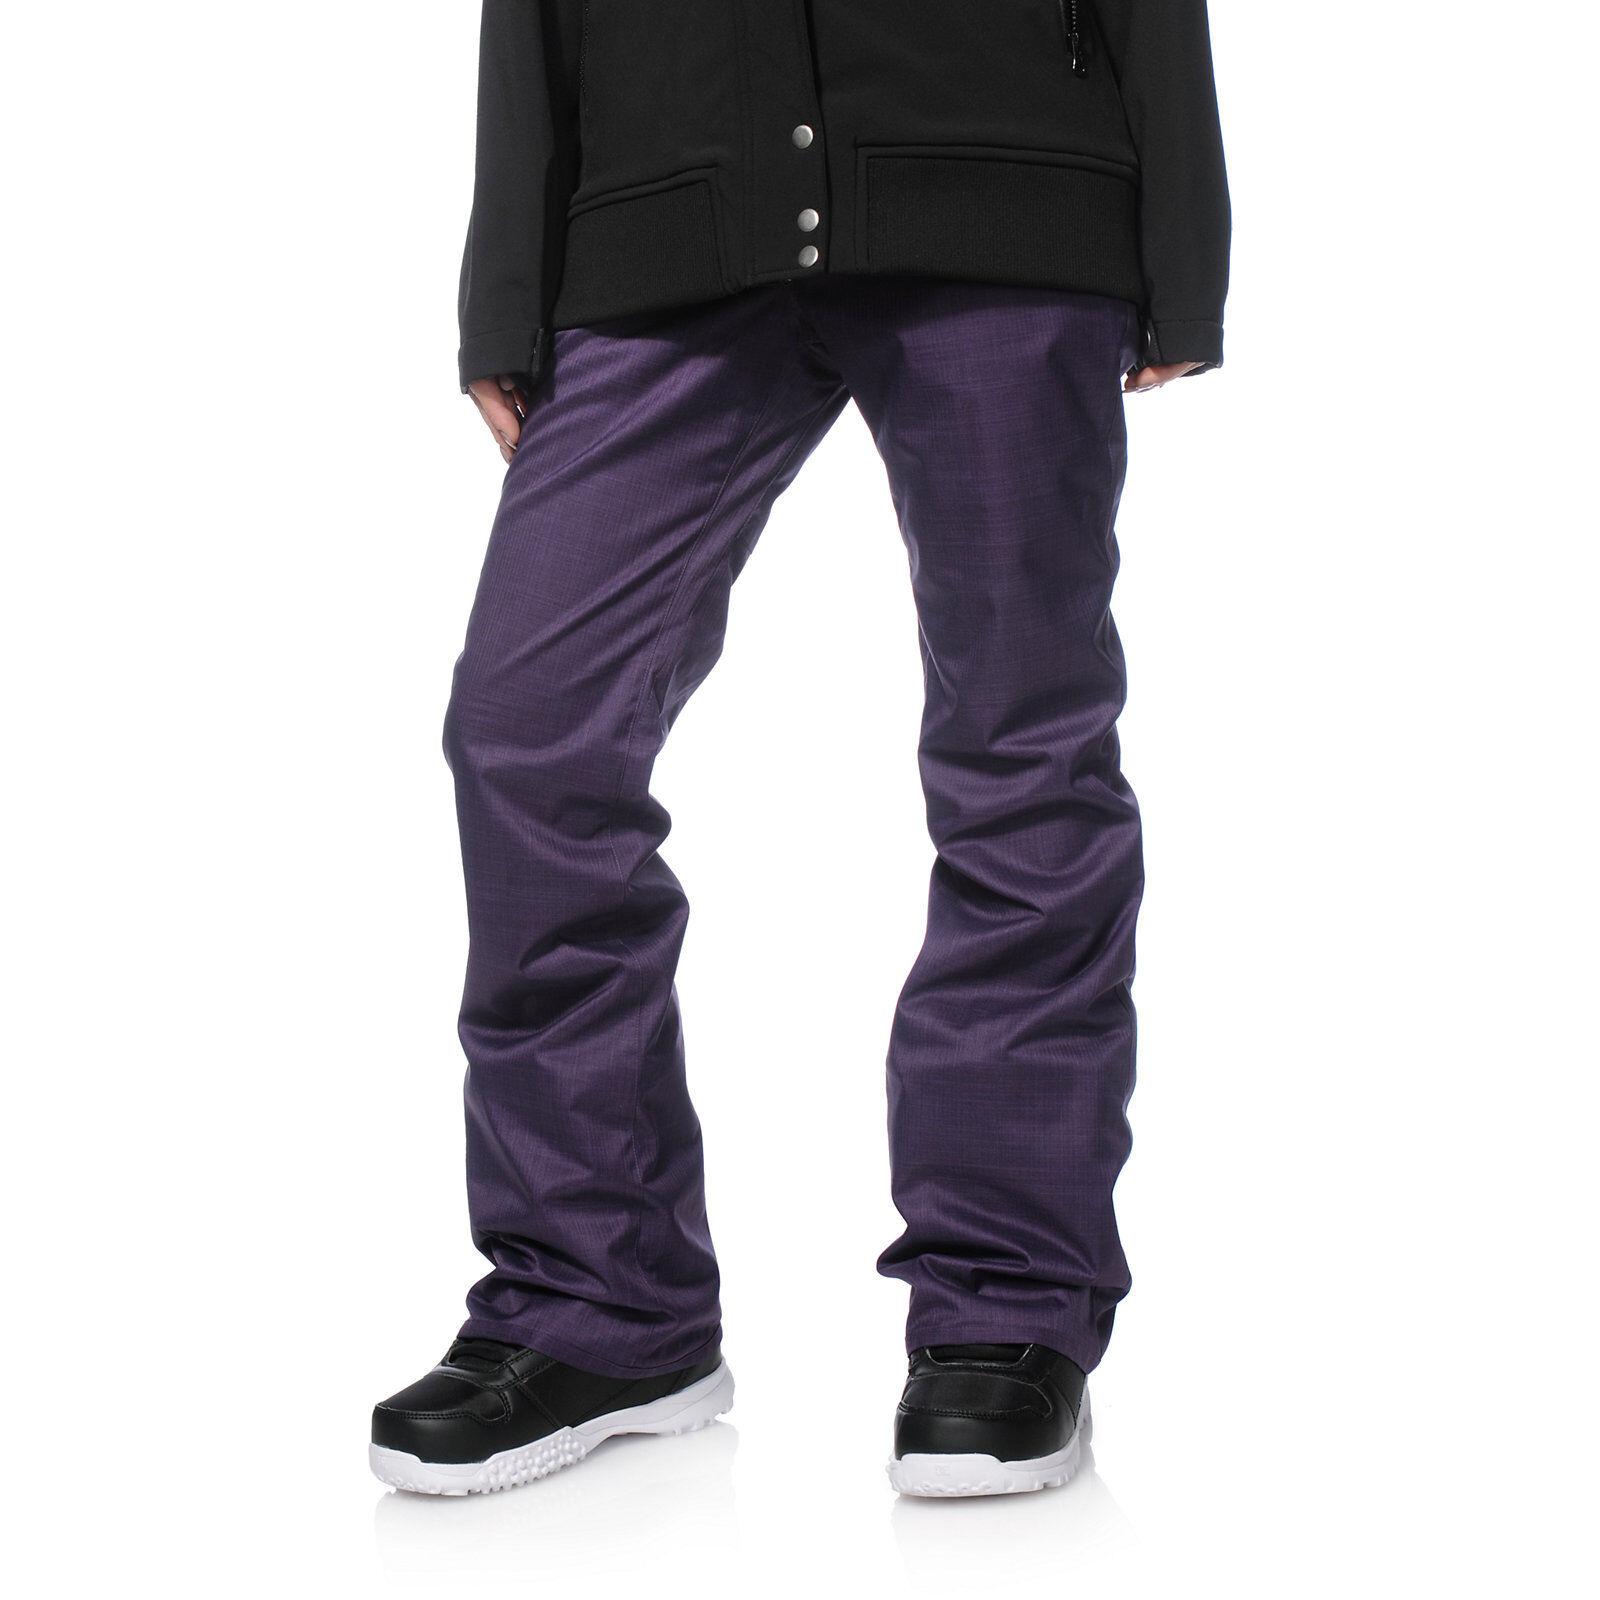 WOMEN'S Volcom Transfer Purple 10K Snowboard Pants NEW